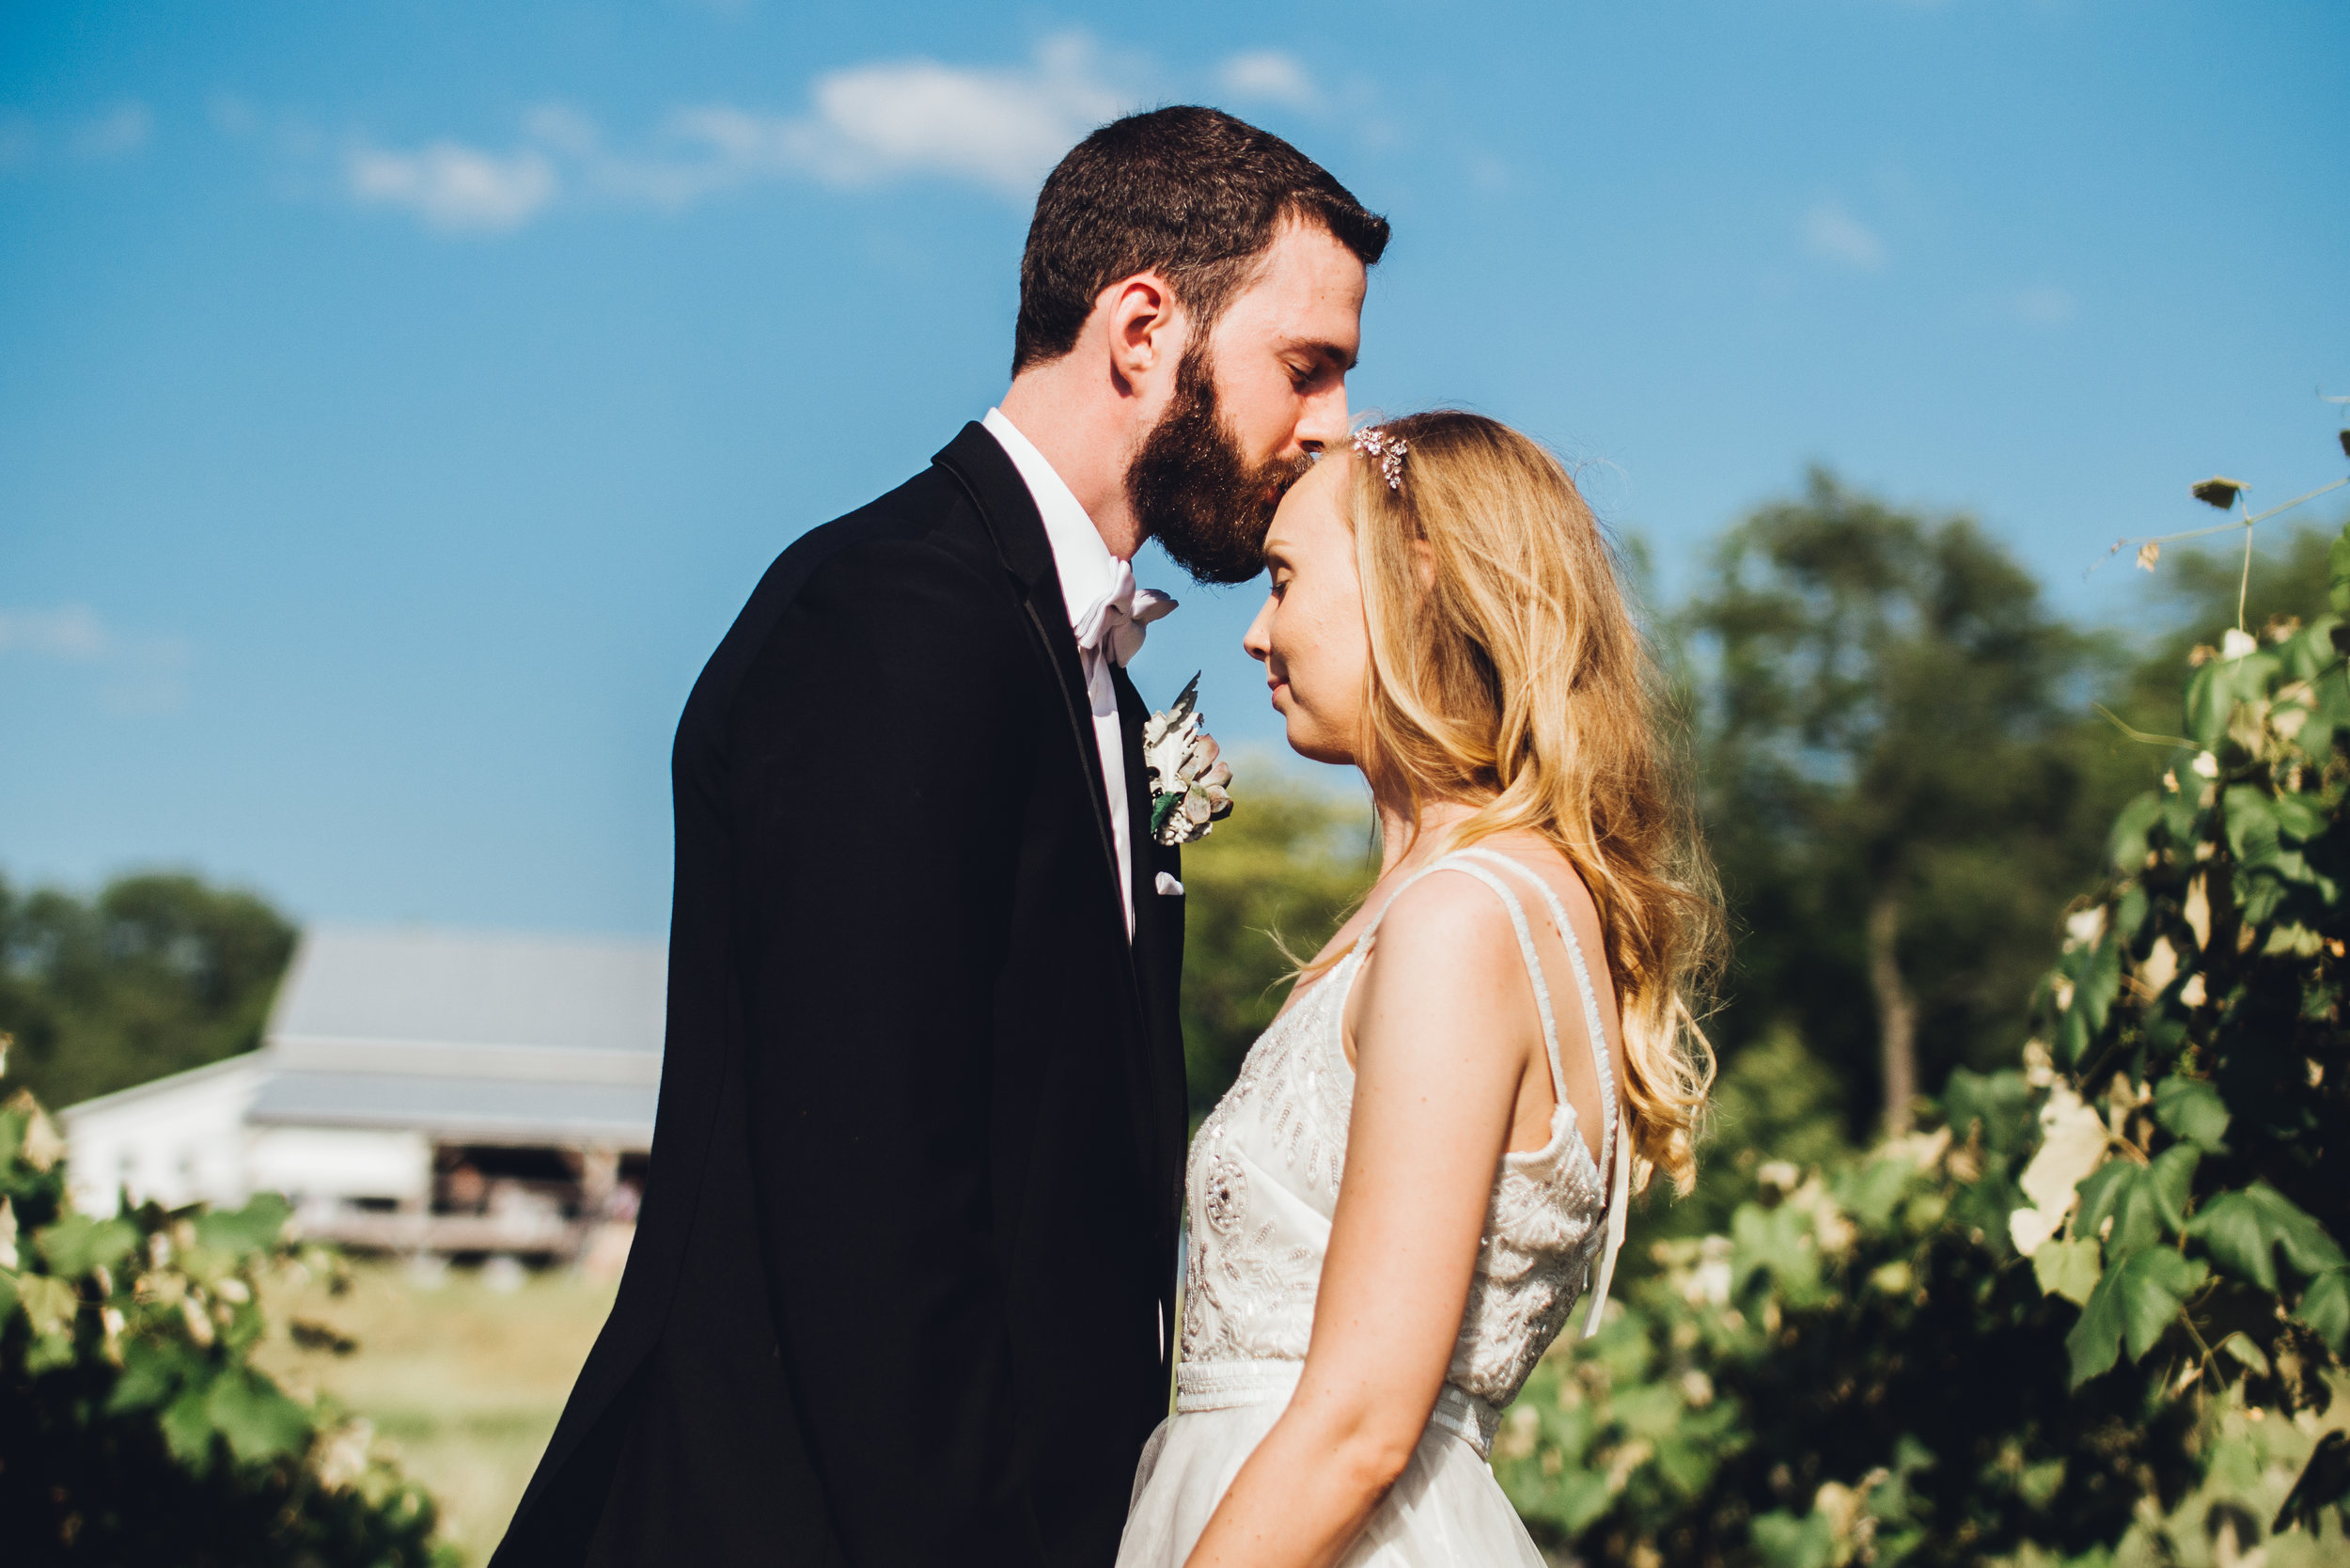 jessica-david-ledwidge-wedding-photos-videos-video-award-winning-michigan-videography-videographers-videographer-photographer-photography-photographers-cinema